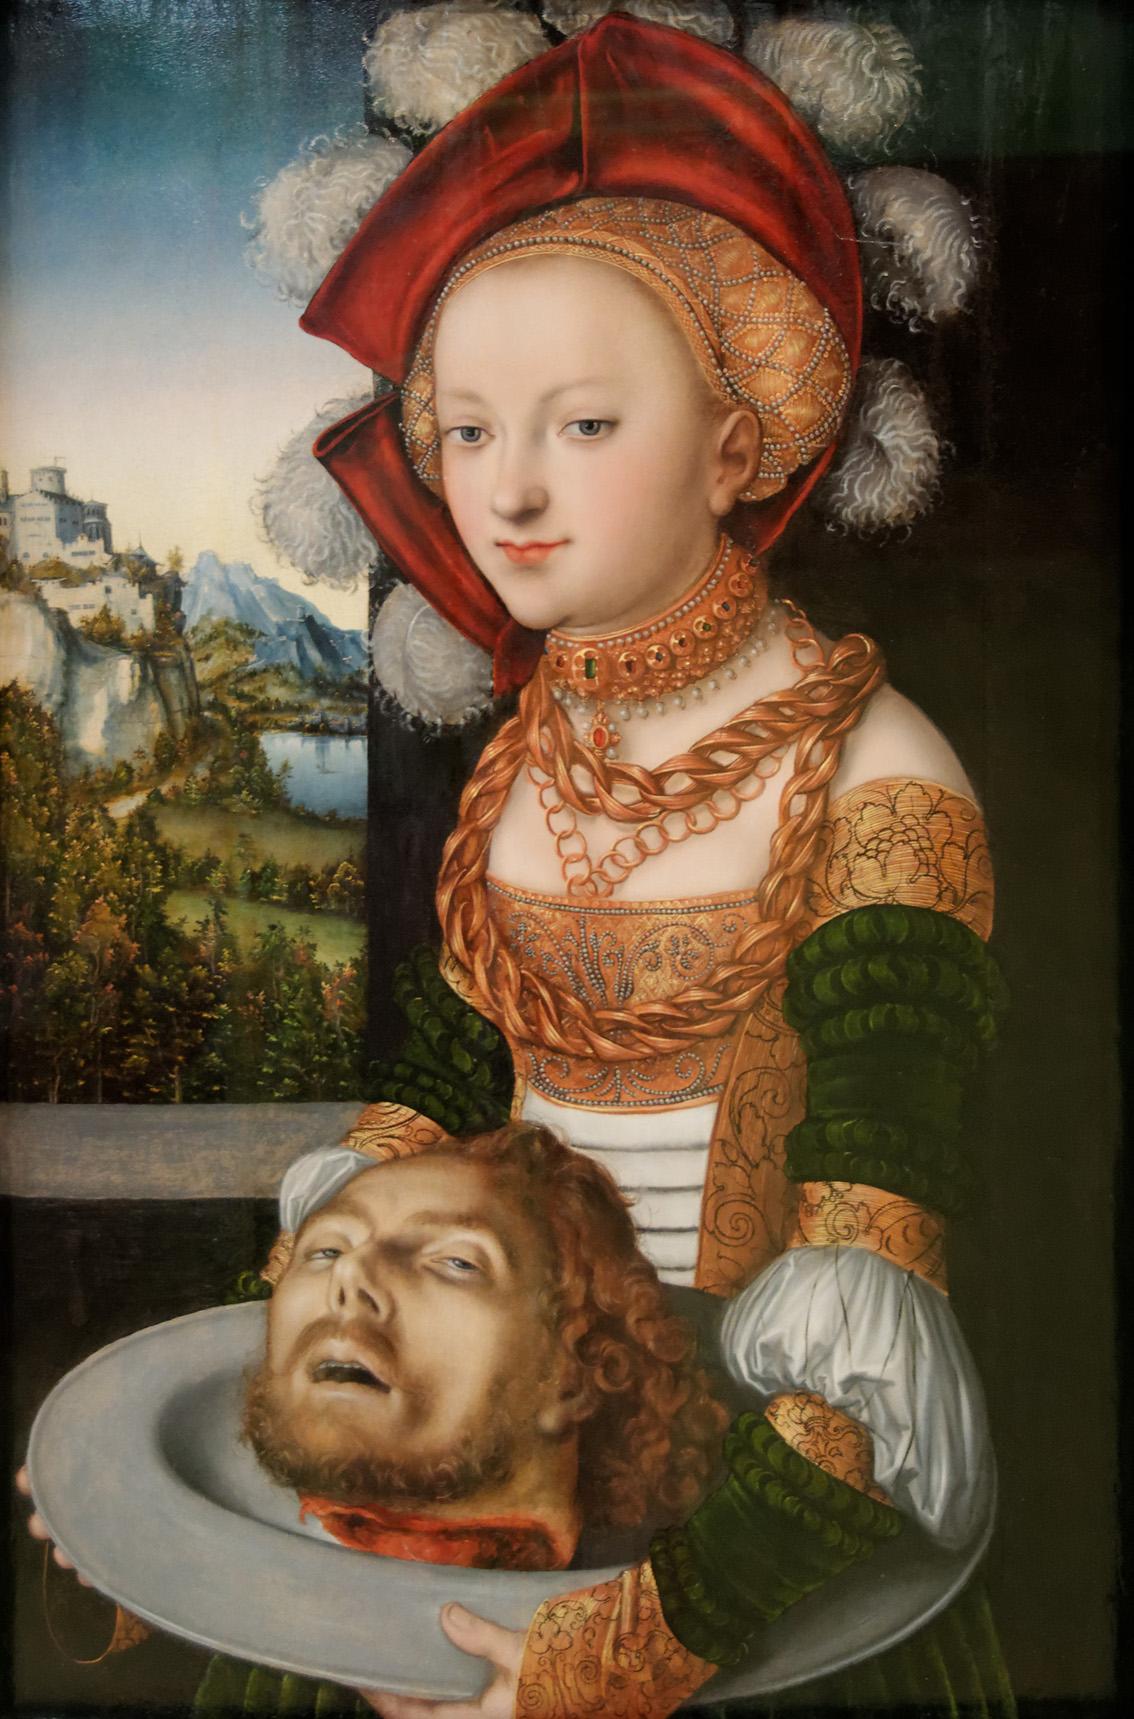 Salomé con la cabeza de san Juan Bautista, de Lucas Cranach.